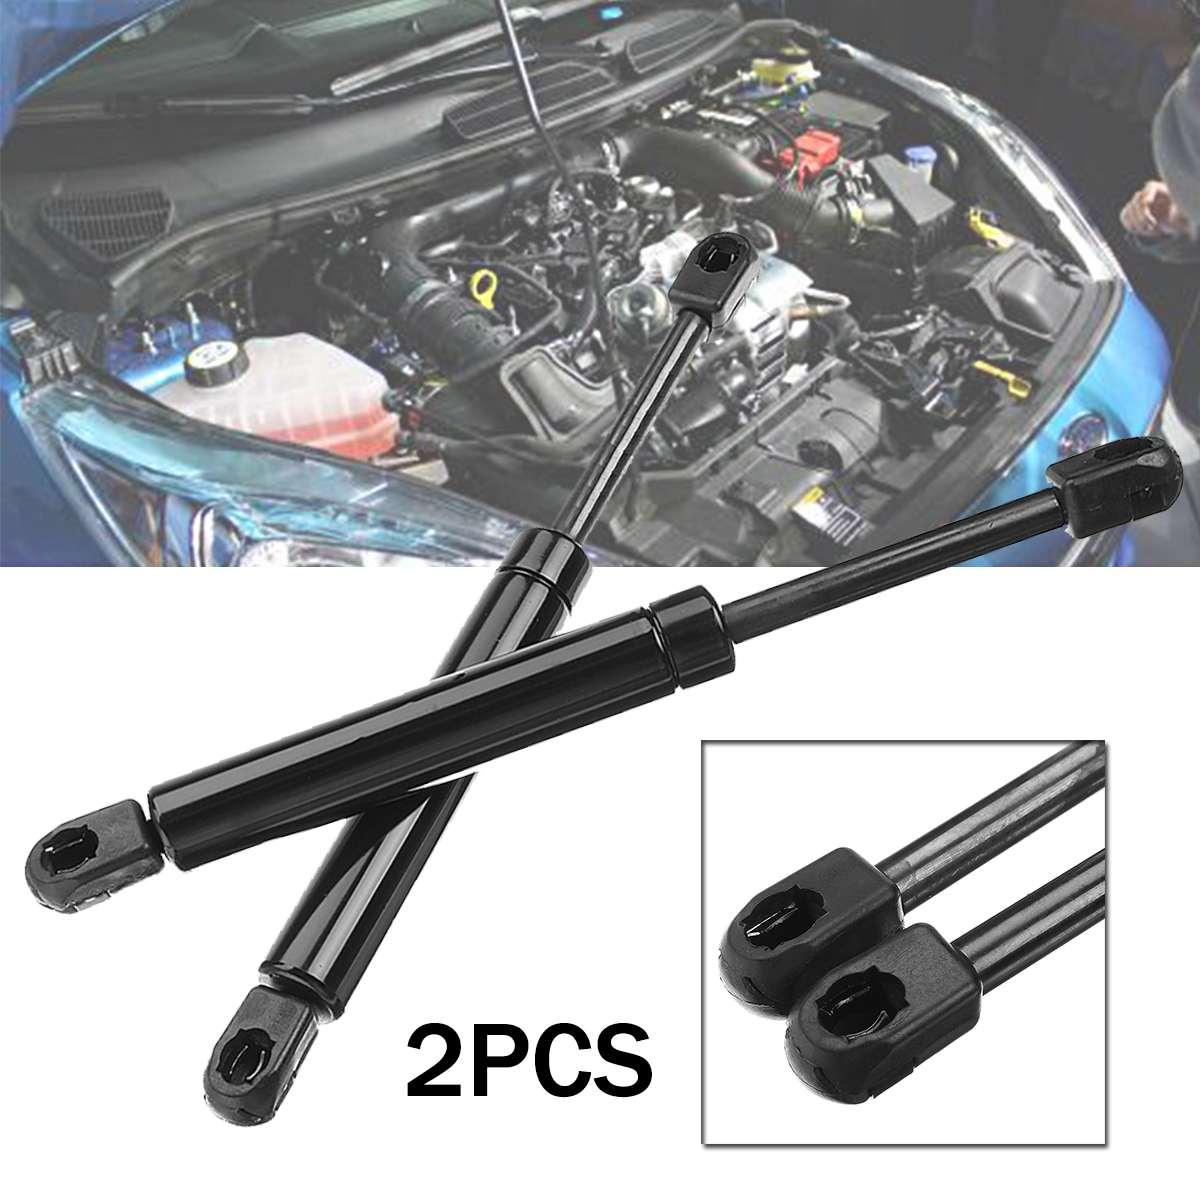 2Pcs สำหรับ Ford Mondeo MK3 2000 2001 2002 2003 2004 2005 2006 2007 รถ-จัดแต่งทรงผม Bonnet แก๊สสปริง Struts โช้คอัพ Lifters